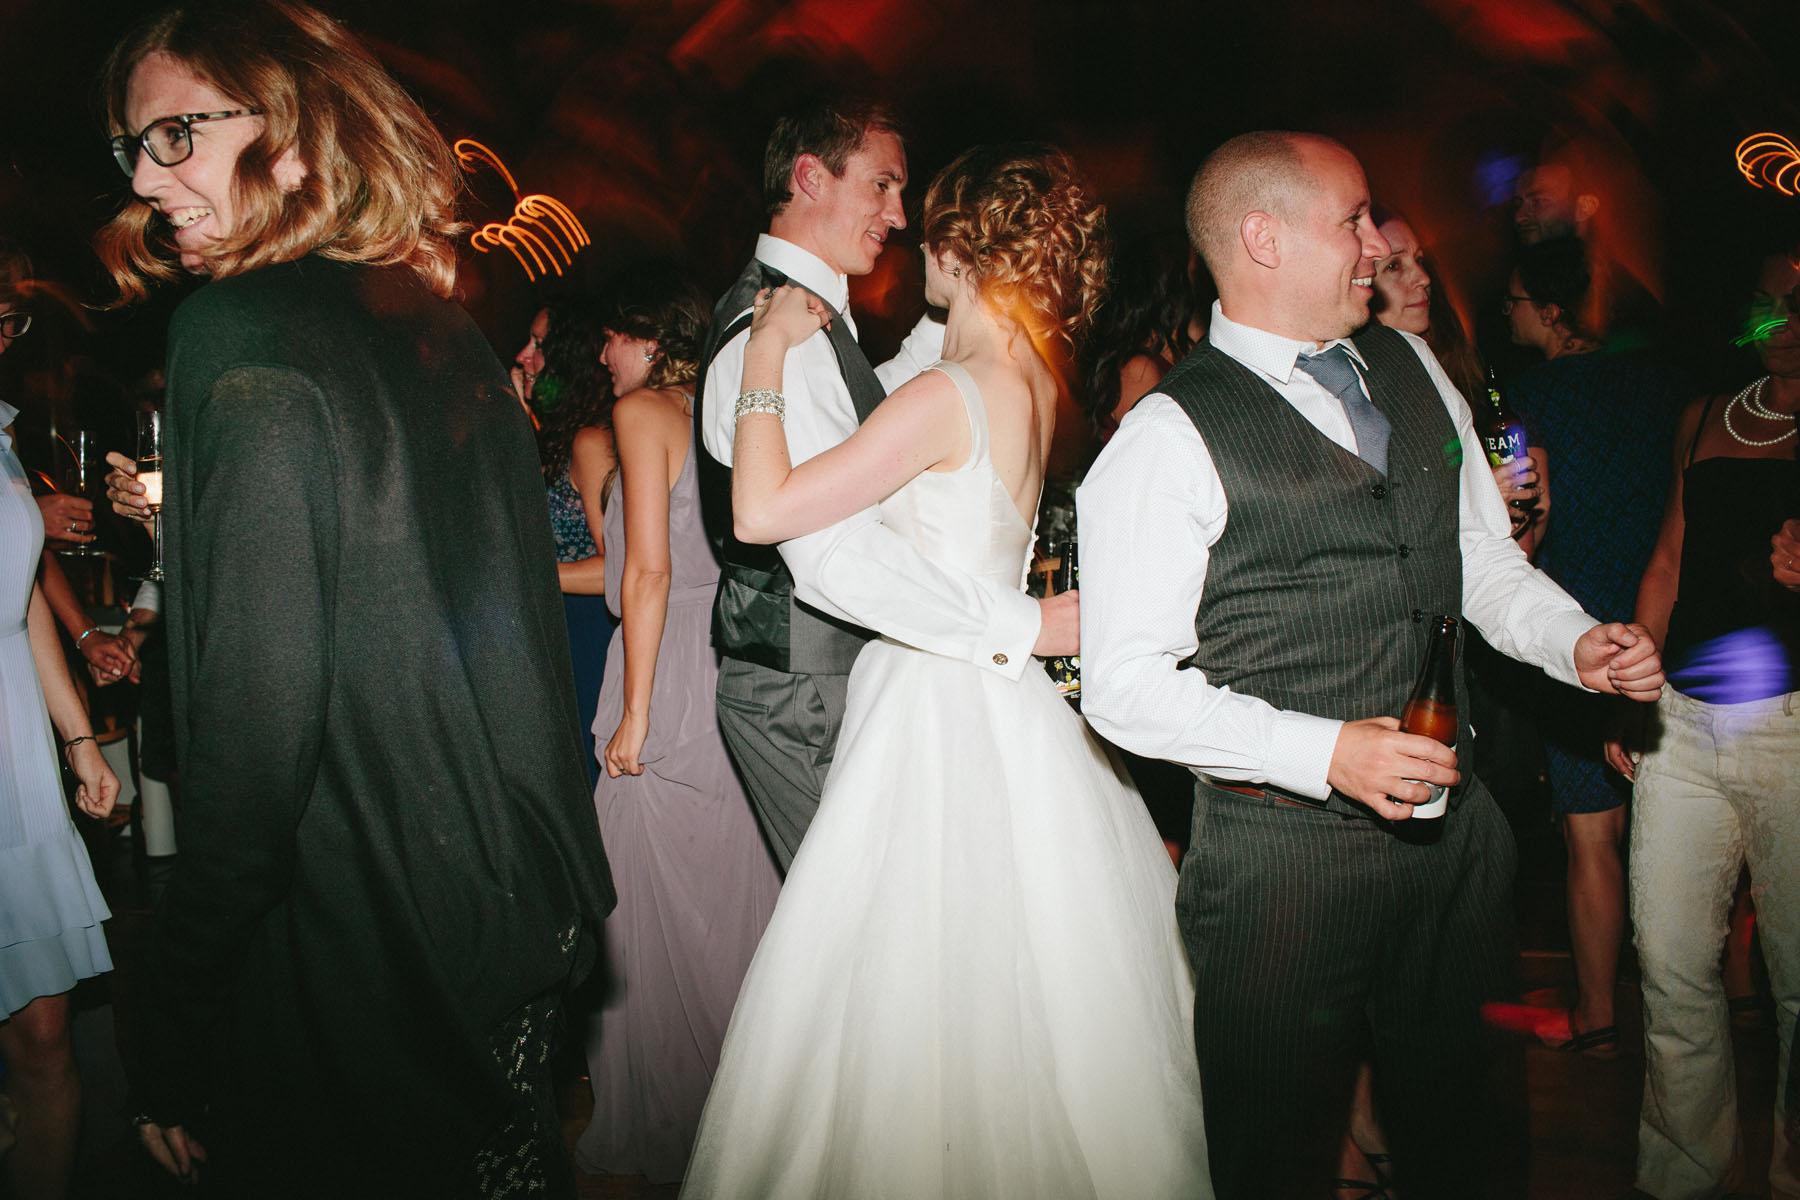 thetis-island-wedding-photographer-rp-rn-212.jpg